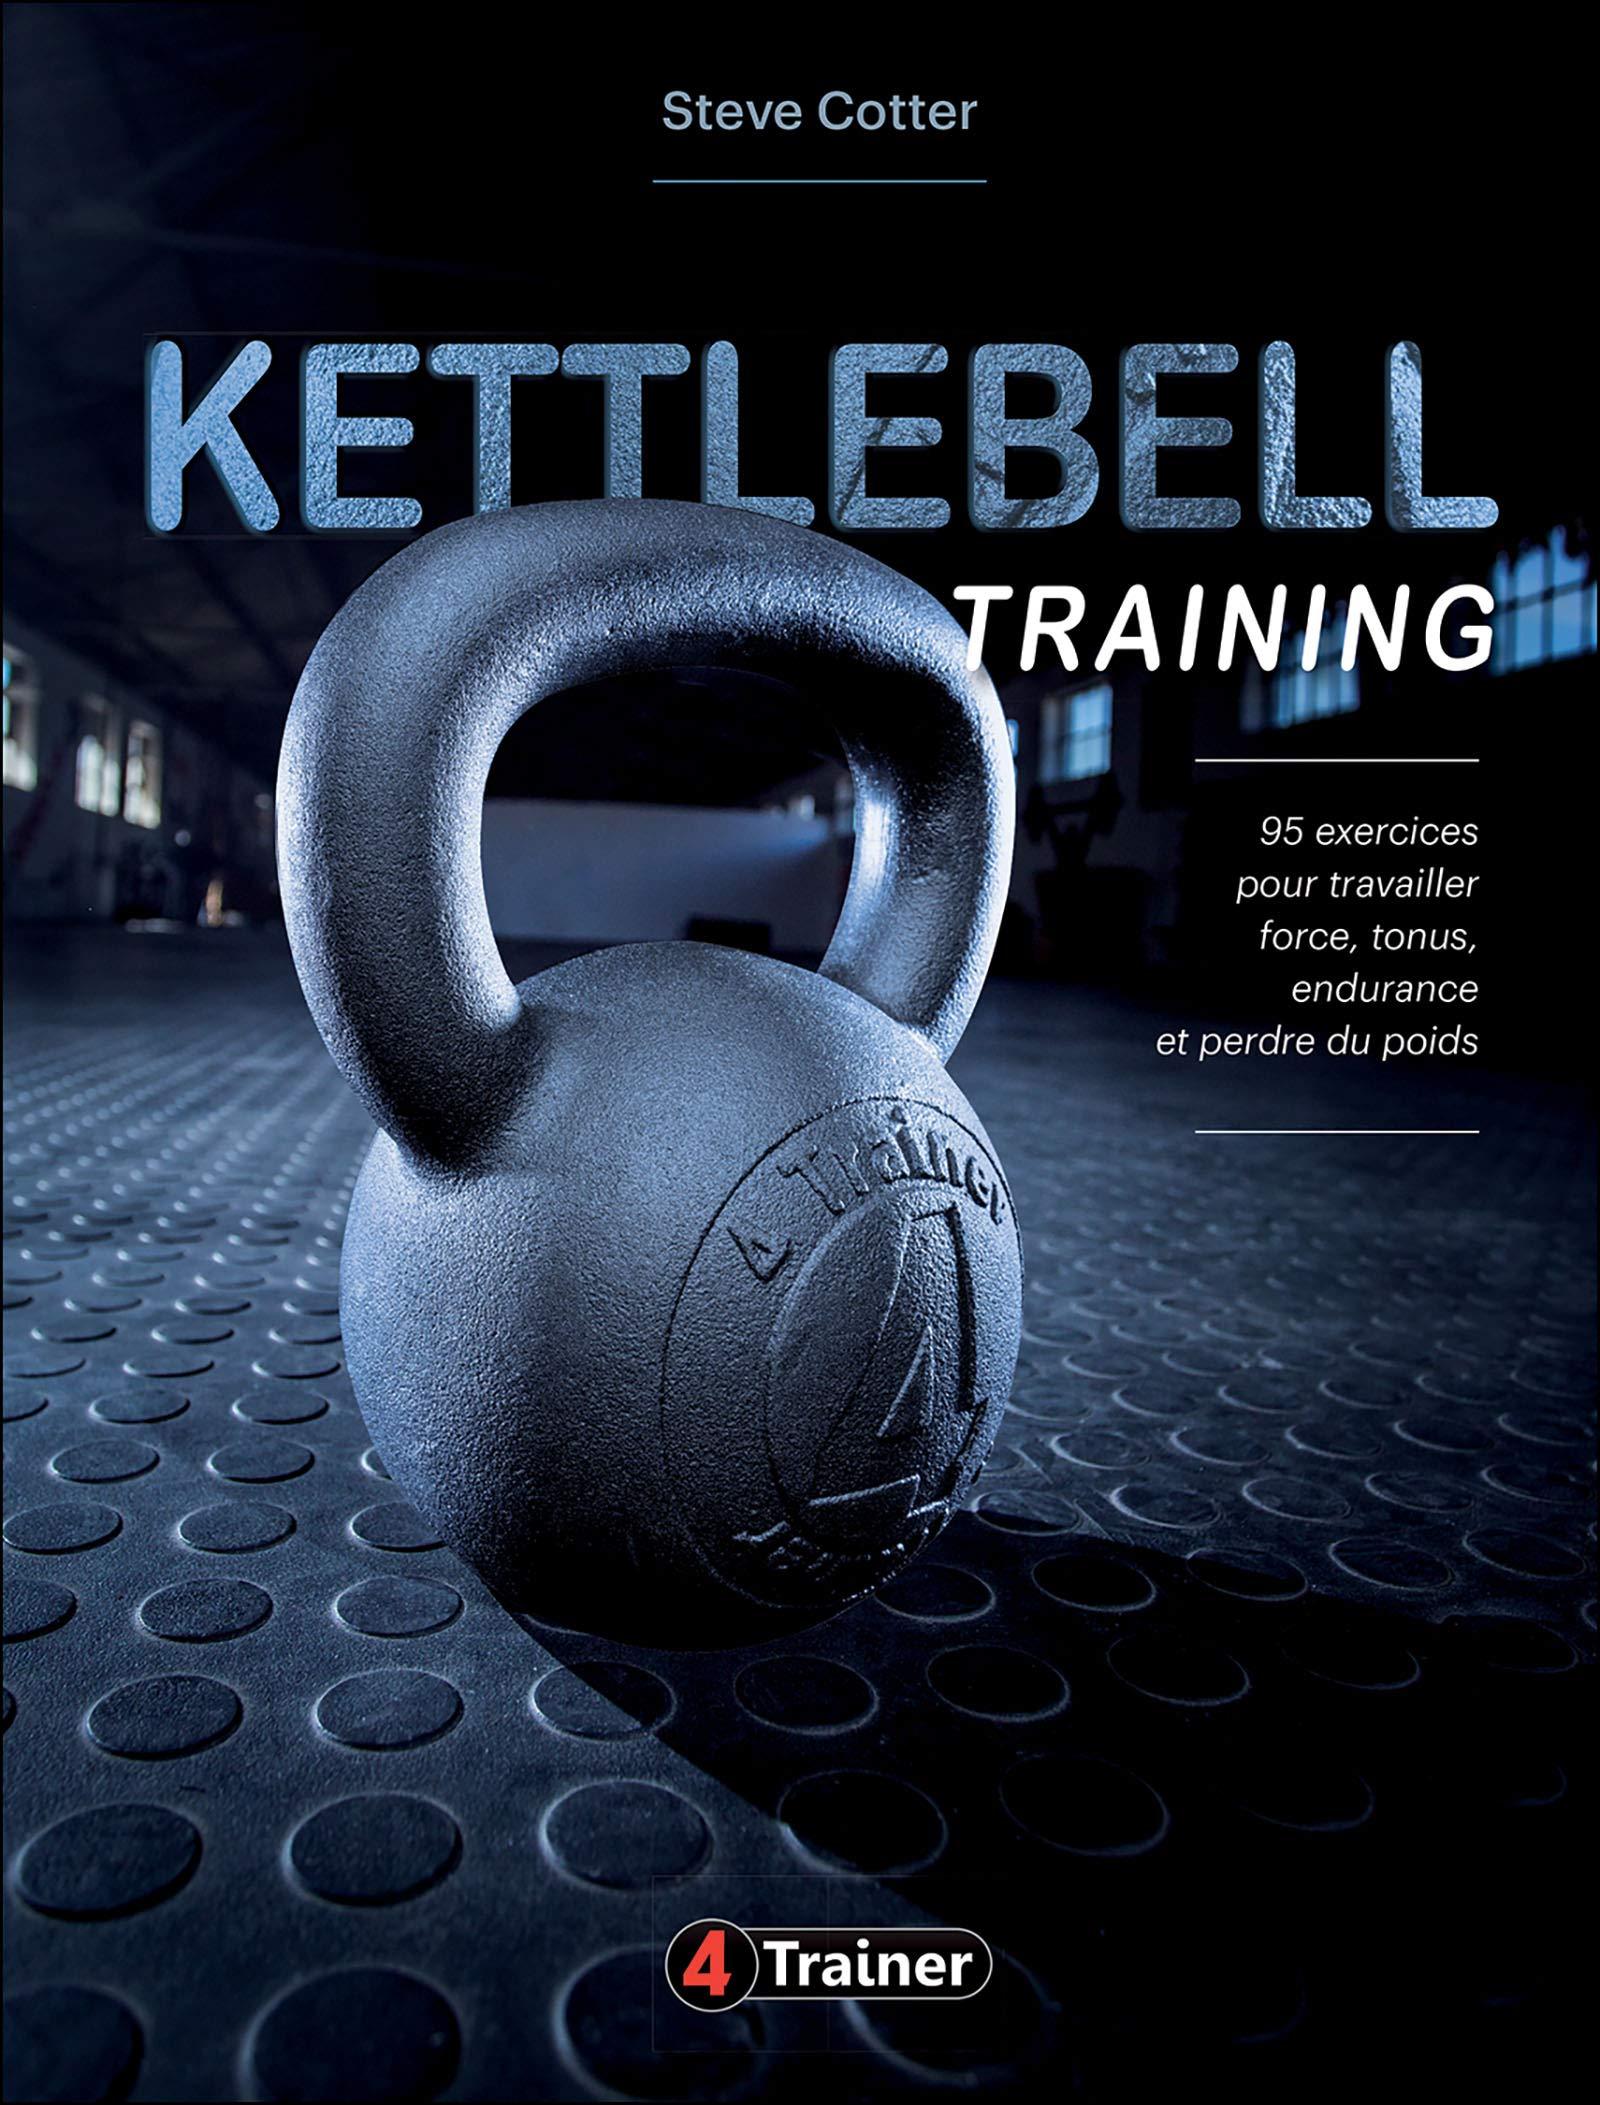 Kettlebell training: Amazon.es: Cotter, Steve, Blackburn, Ken ...